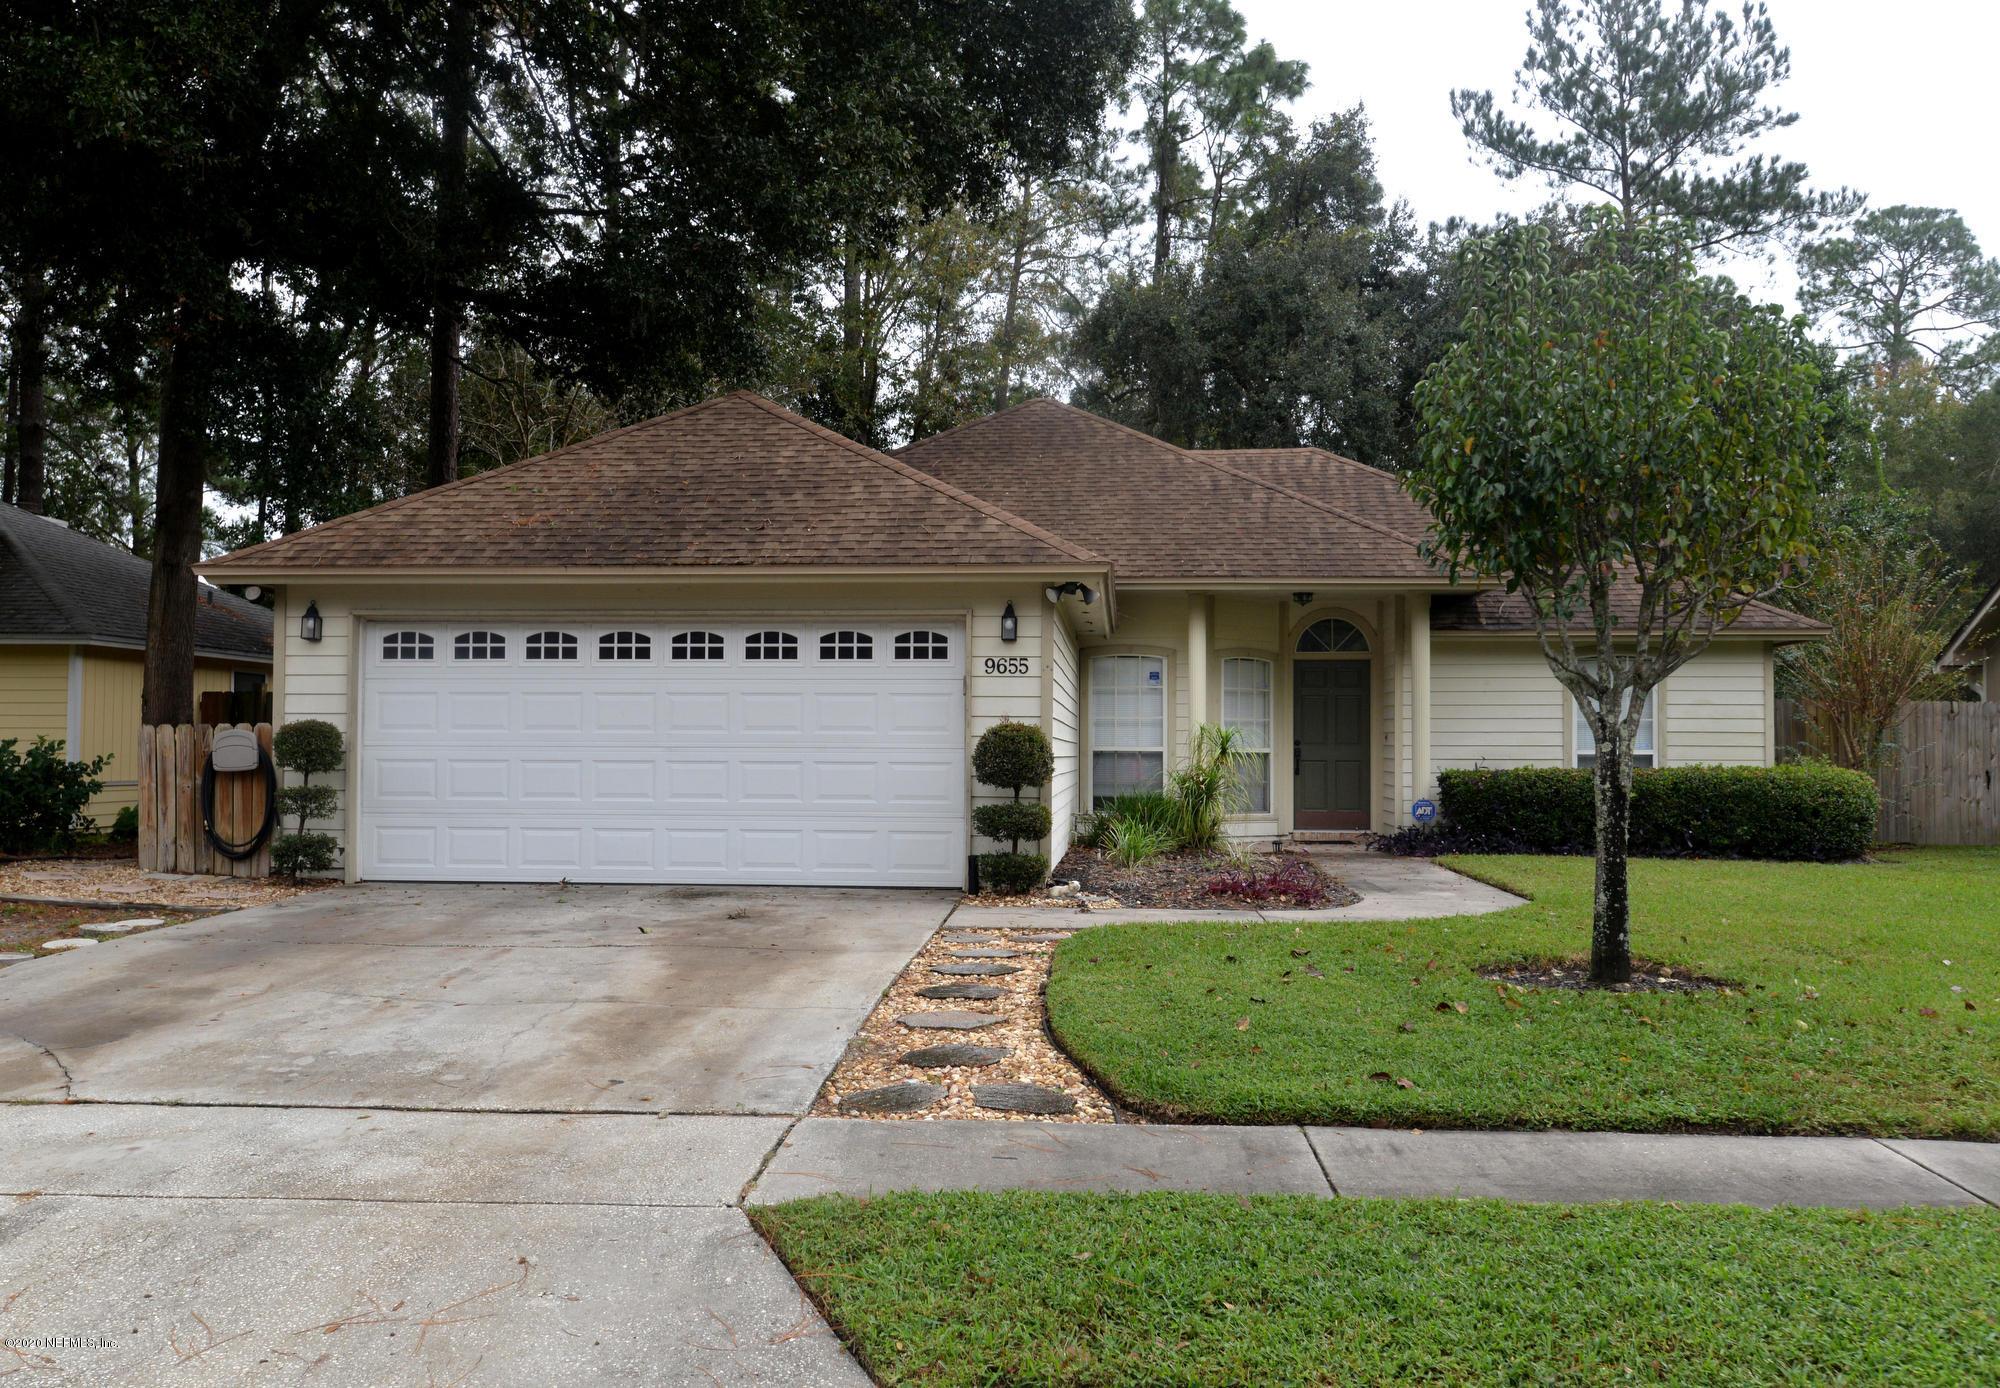 9655 BAYOU BLUFF, JACKSONVILLE, FLORIDA 32257, 3 Bedrooms Bedrooms, ,2 BathroomsBathrooms,Residential,For sale,BAYOU BLUFF,1082638